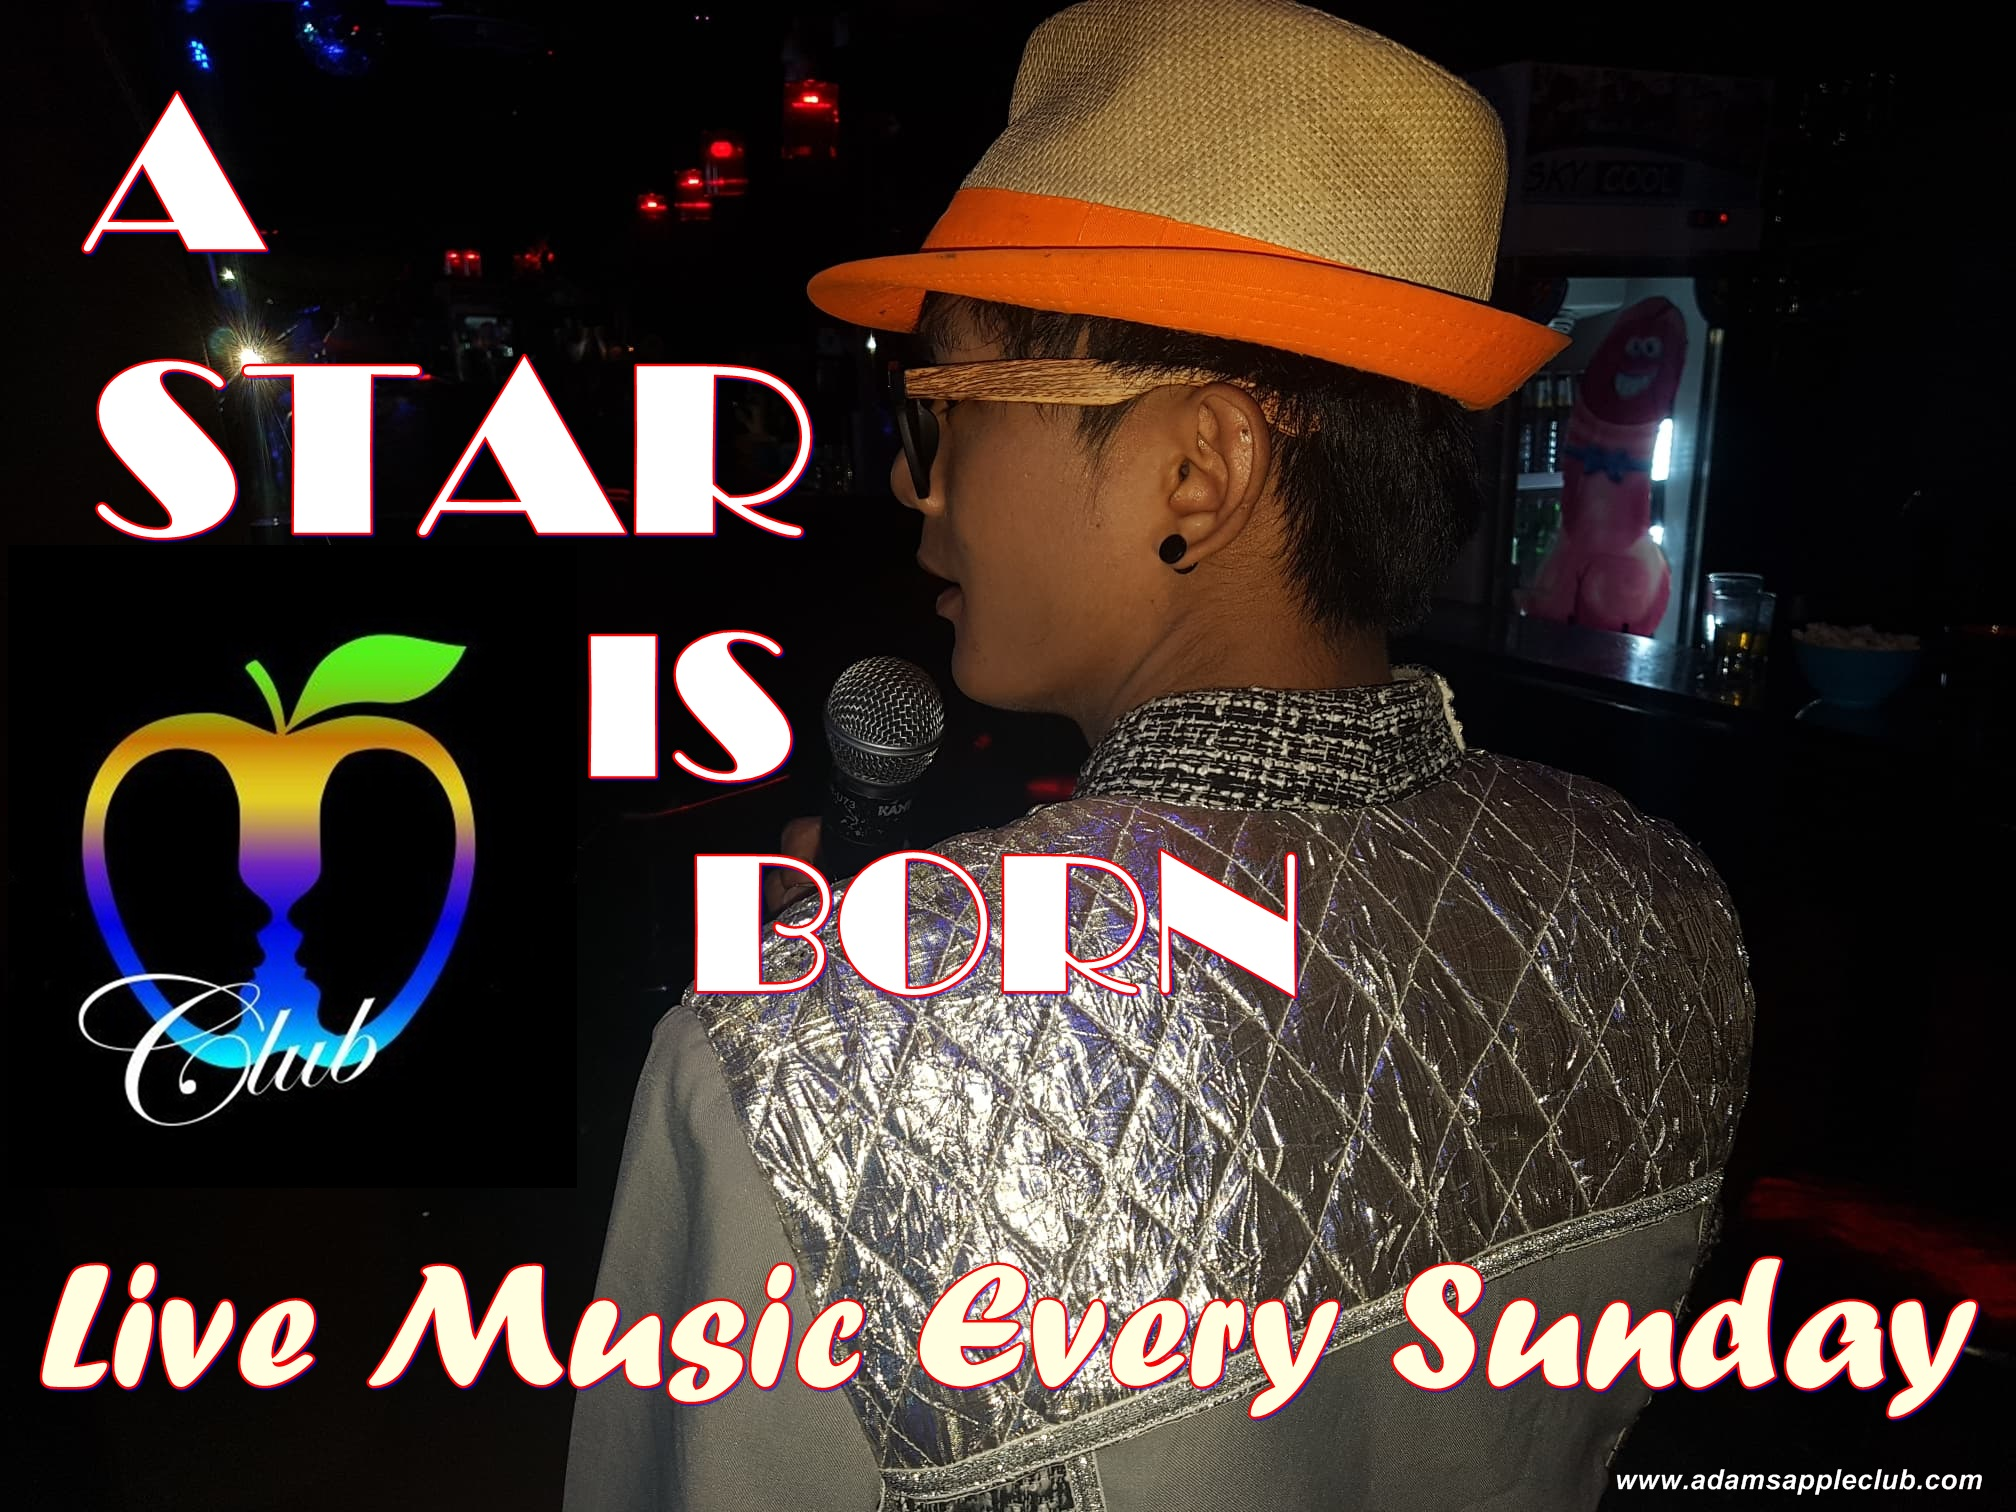 A STAR IS BORN Adams Apple Club Chiang Mai